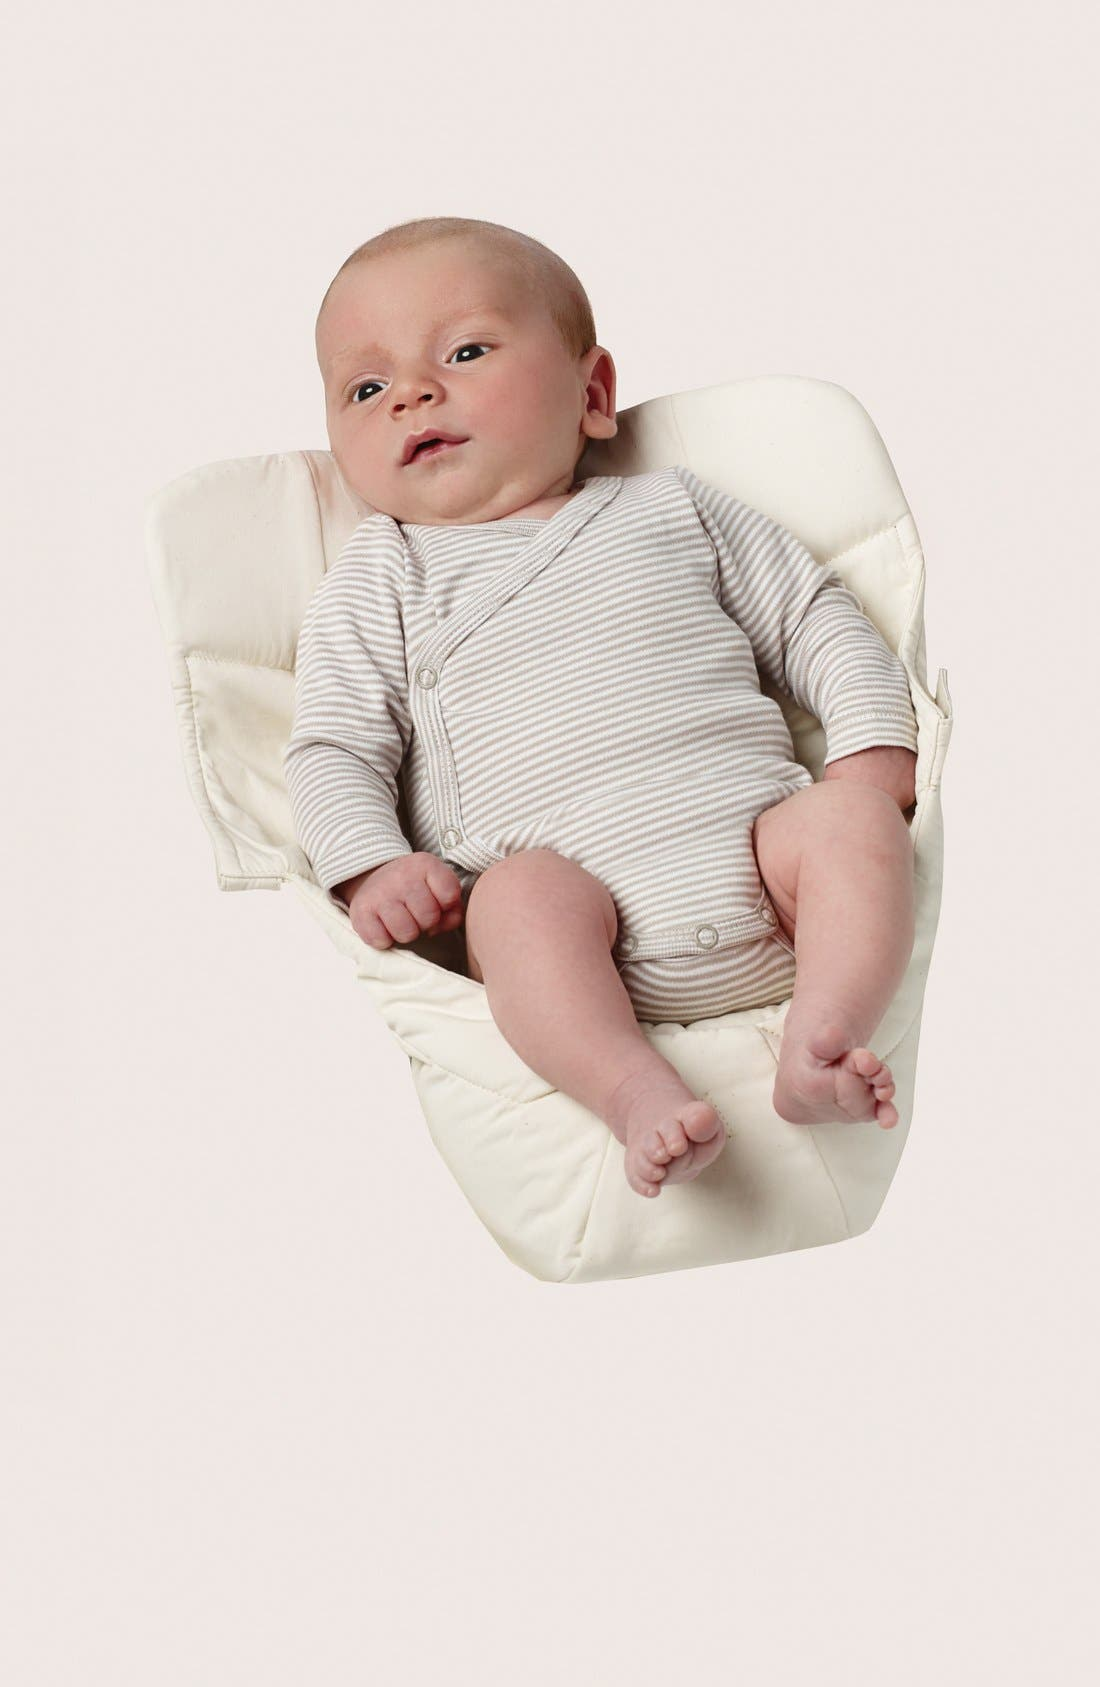 'Easy Snug' Cotton Poplin Baby Insert,                             Main thumbnail 1, color,                             NATURAL